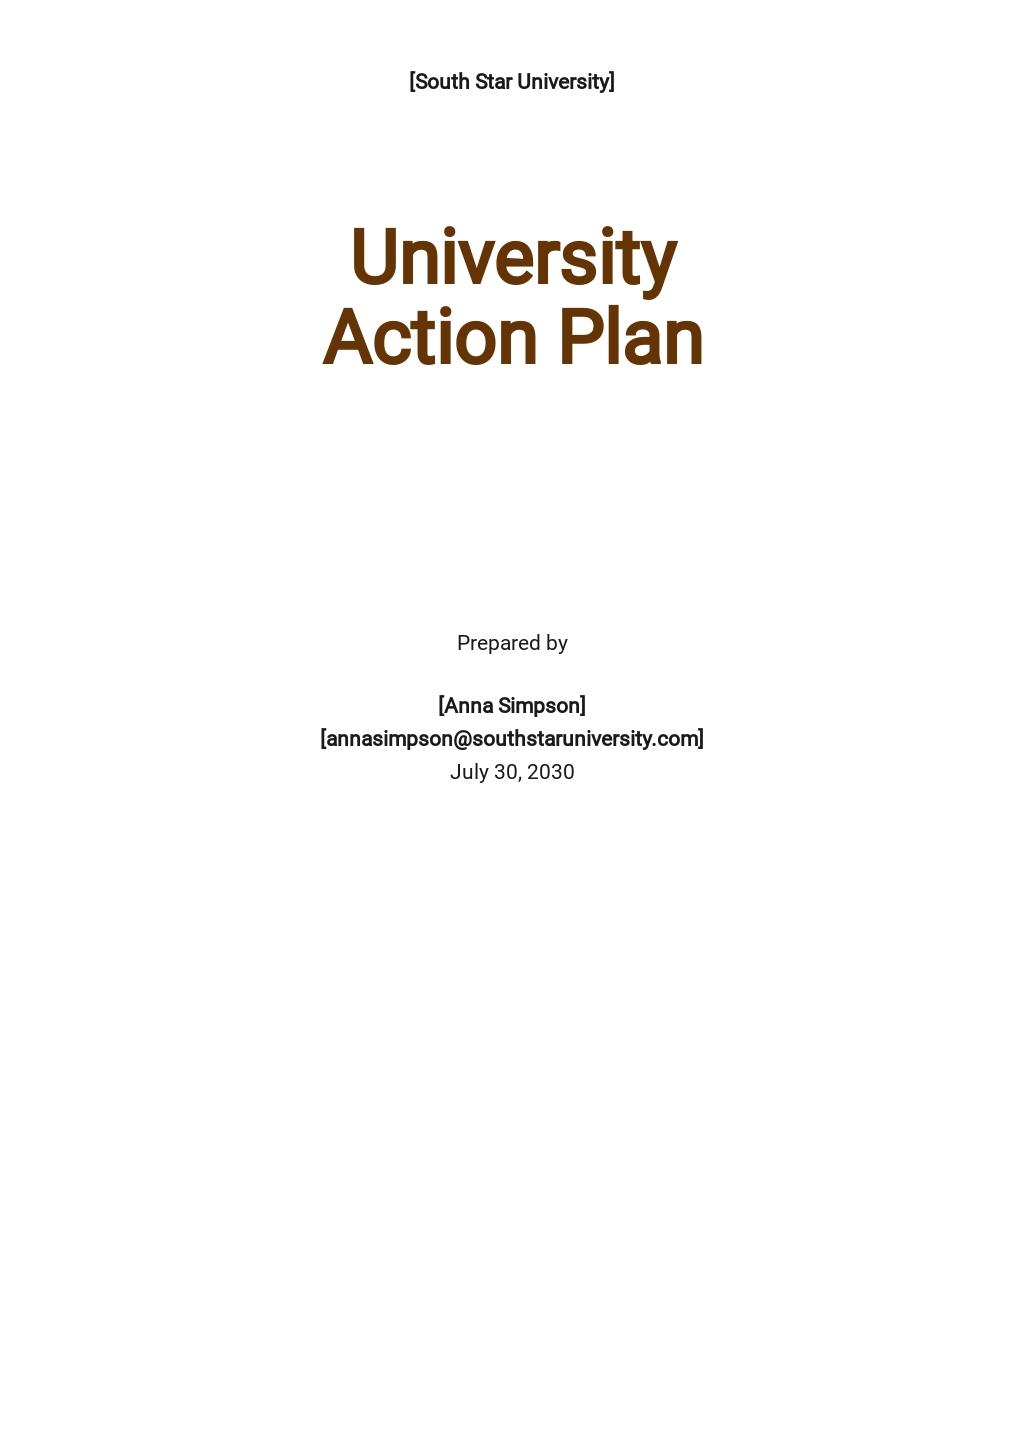 University Action Plan Template